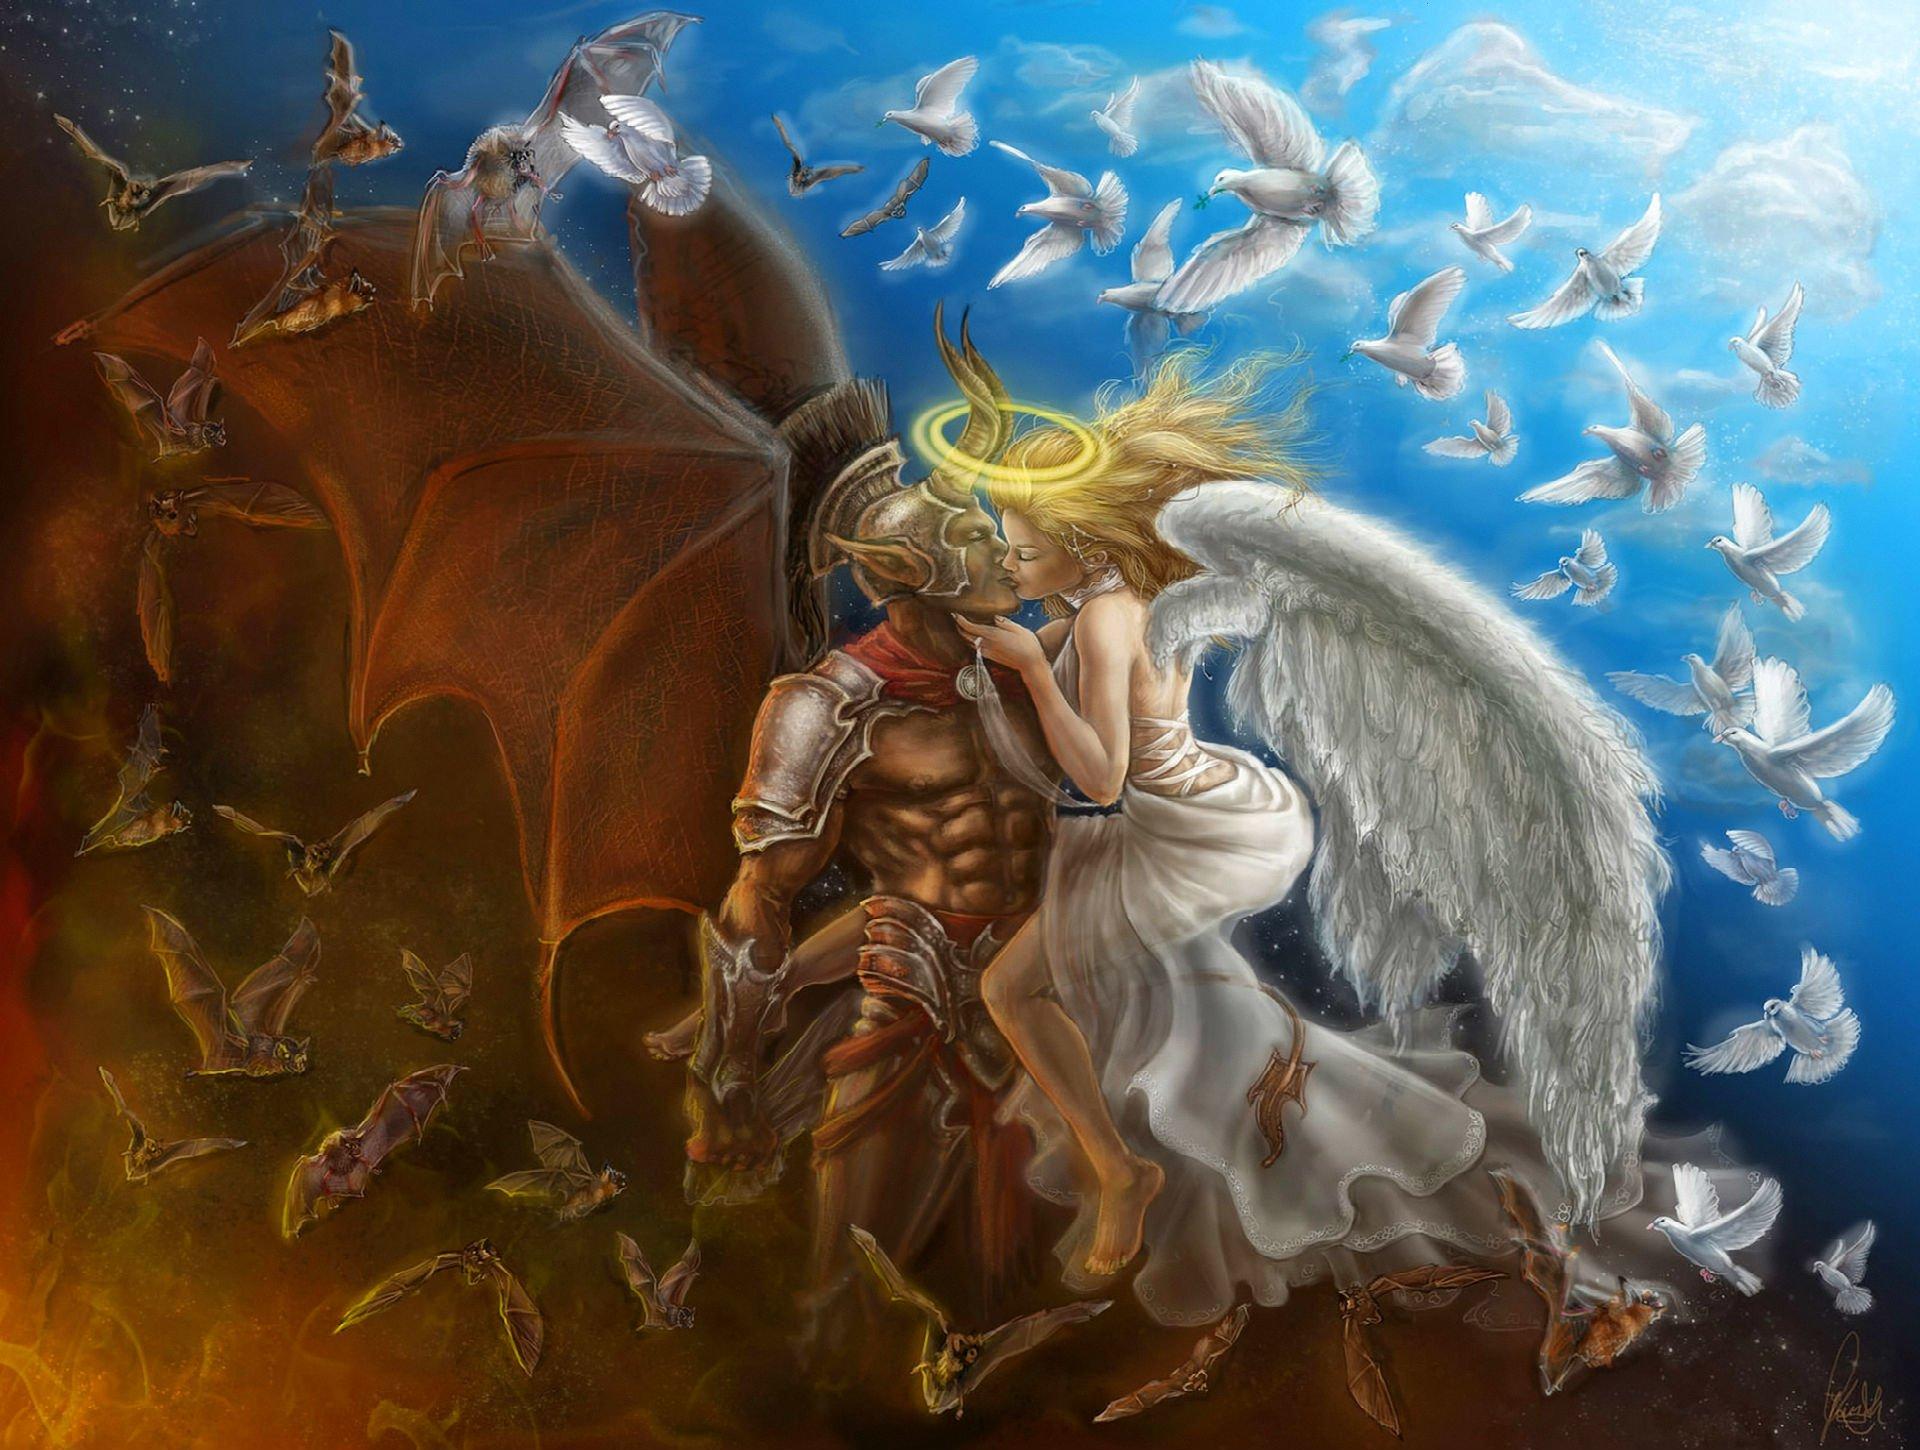 Fantasy - Love  Good vs. Evil Angel Demon Oocult Dove Bat Wallpaper